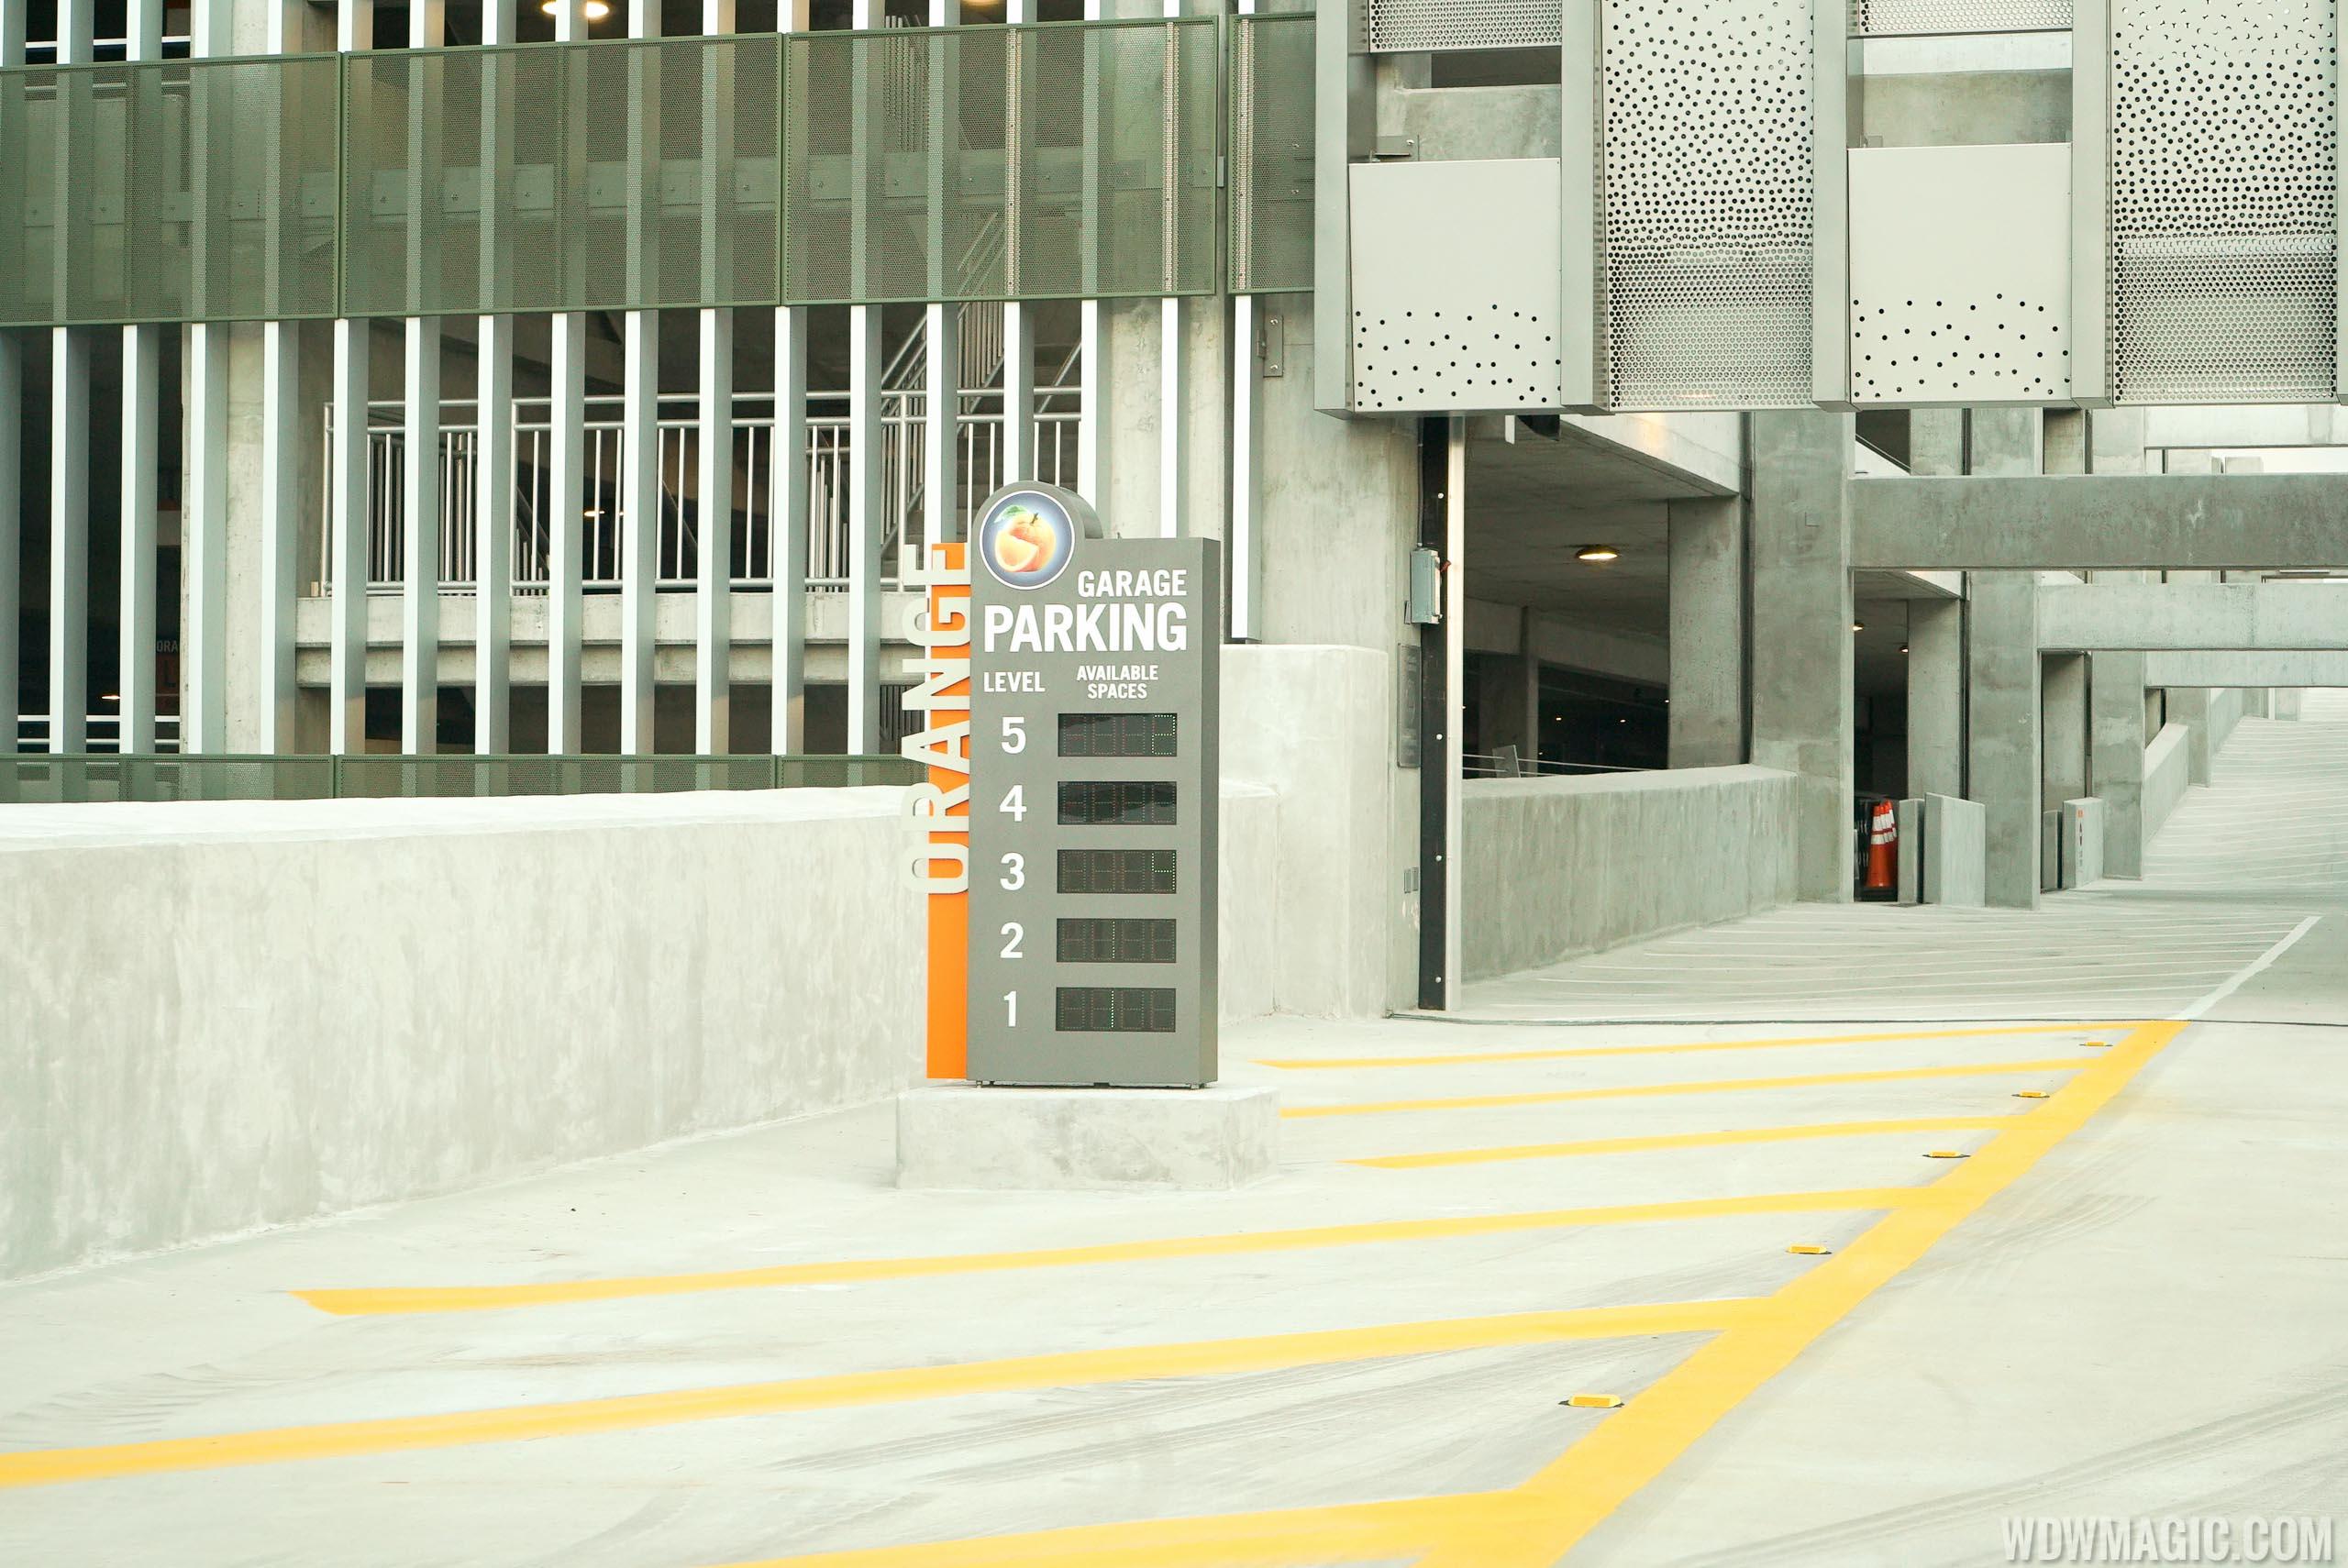 Flyover ramp from Buena Vista Drive to Orange Garage